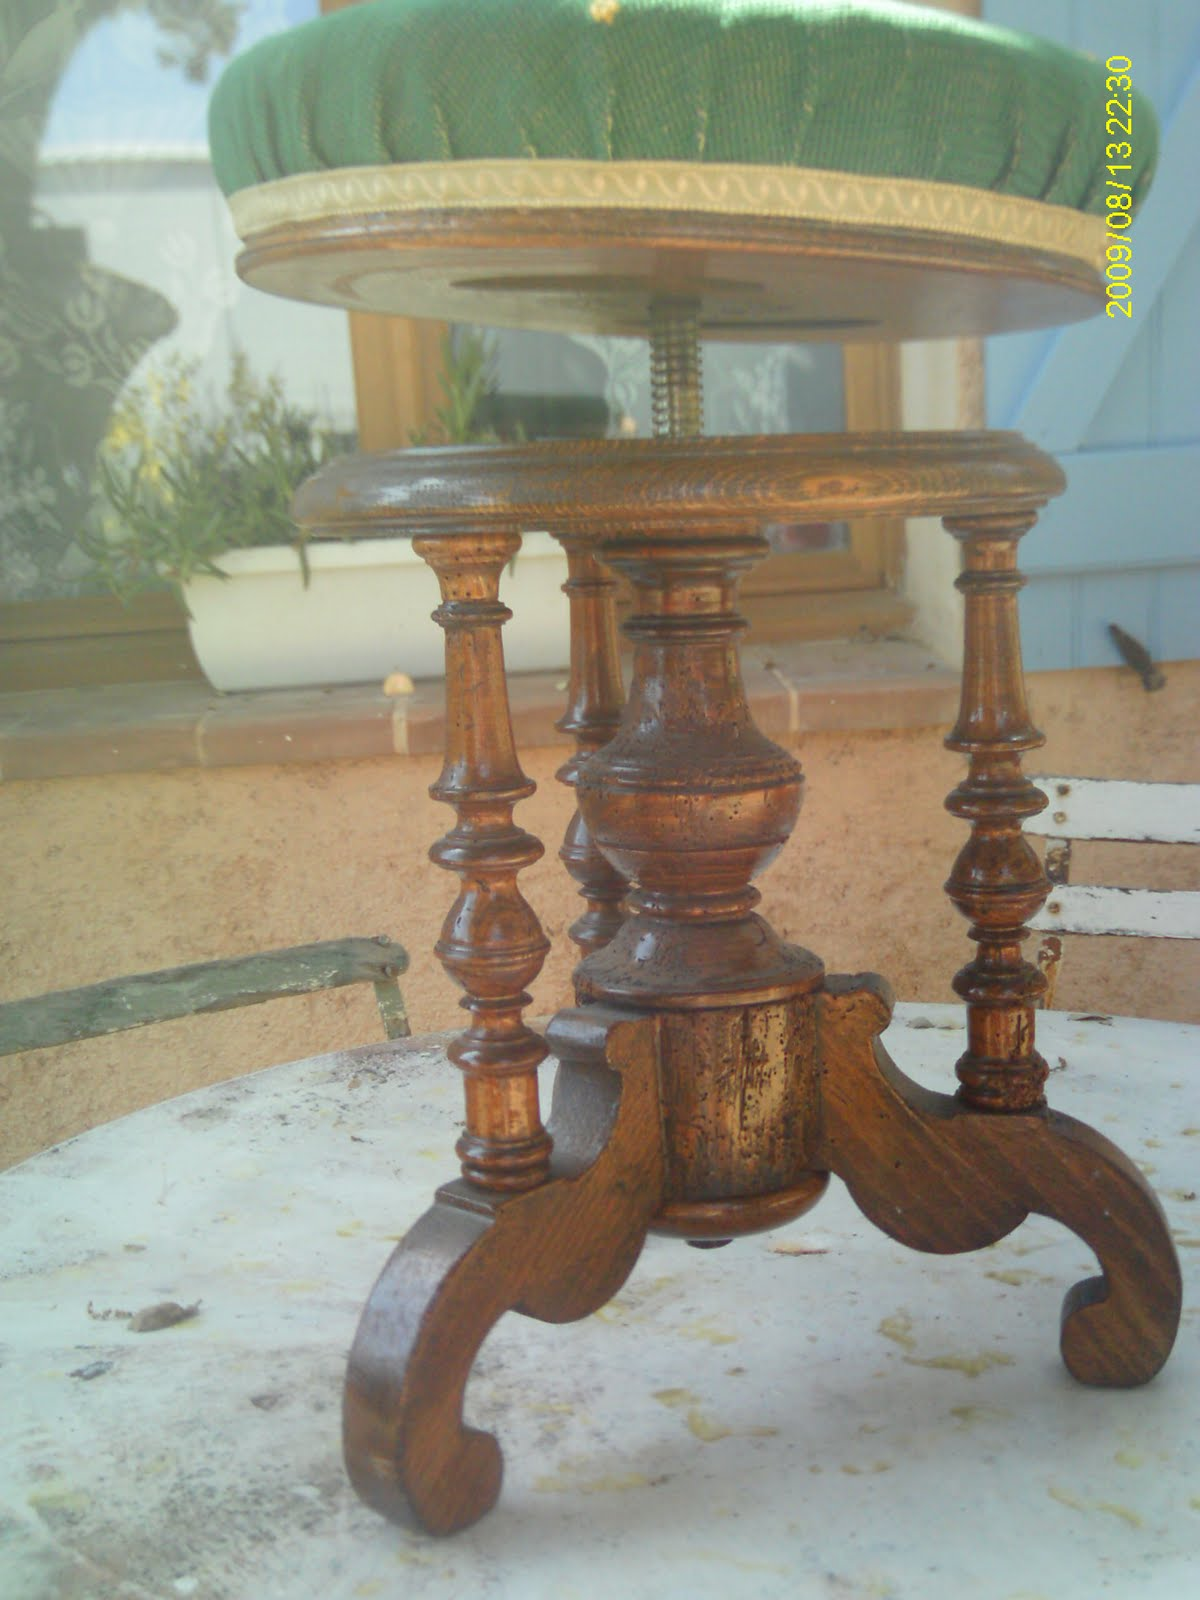 ancien tabouret de piano bois napol on iii empire restauration. Black Bedroom Furniture Sets. Home Design Ideas